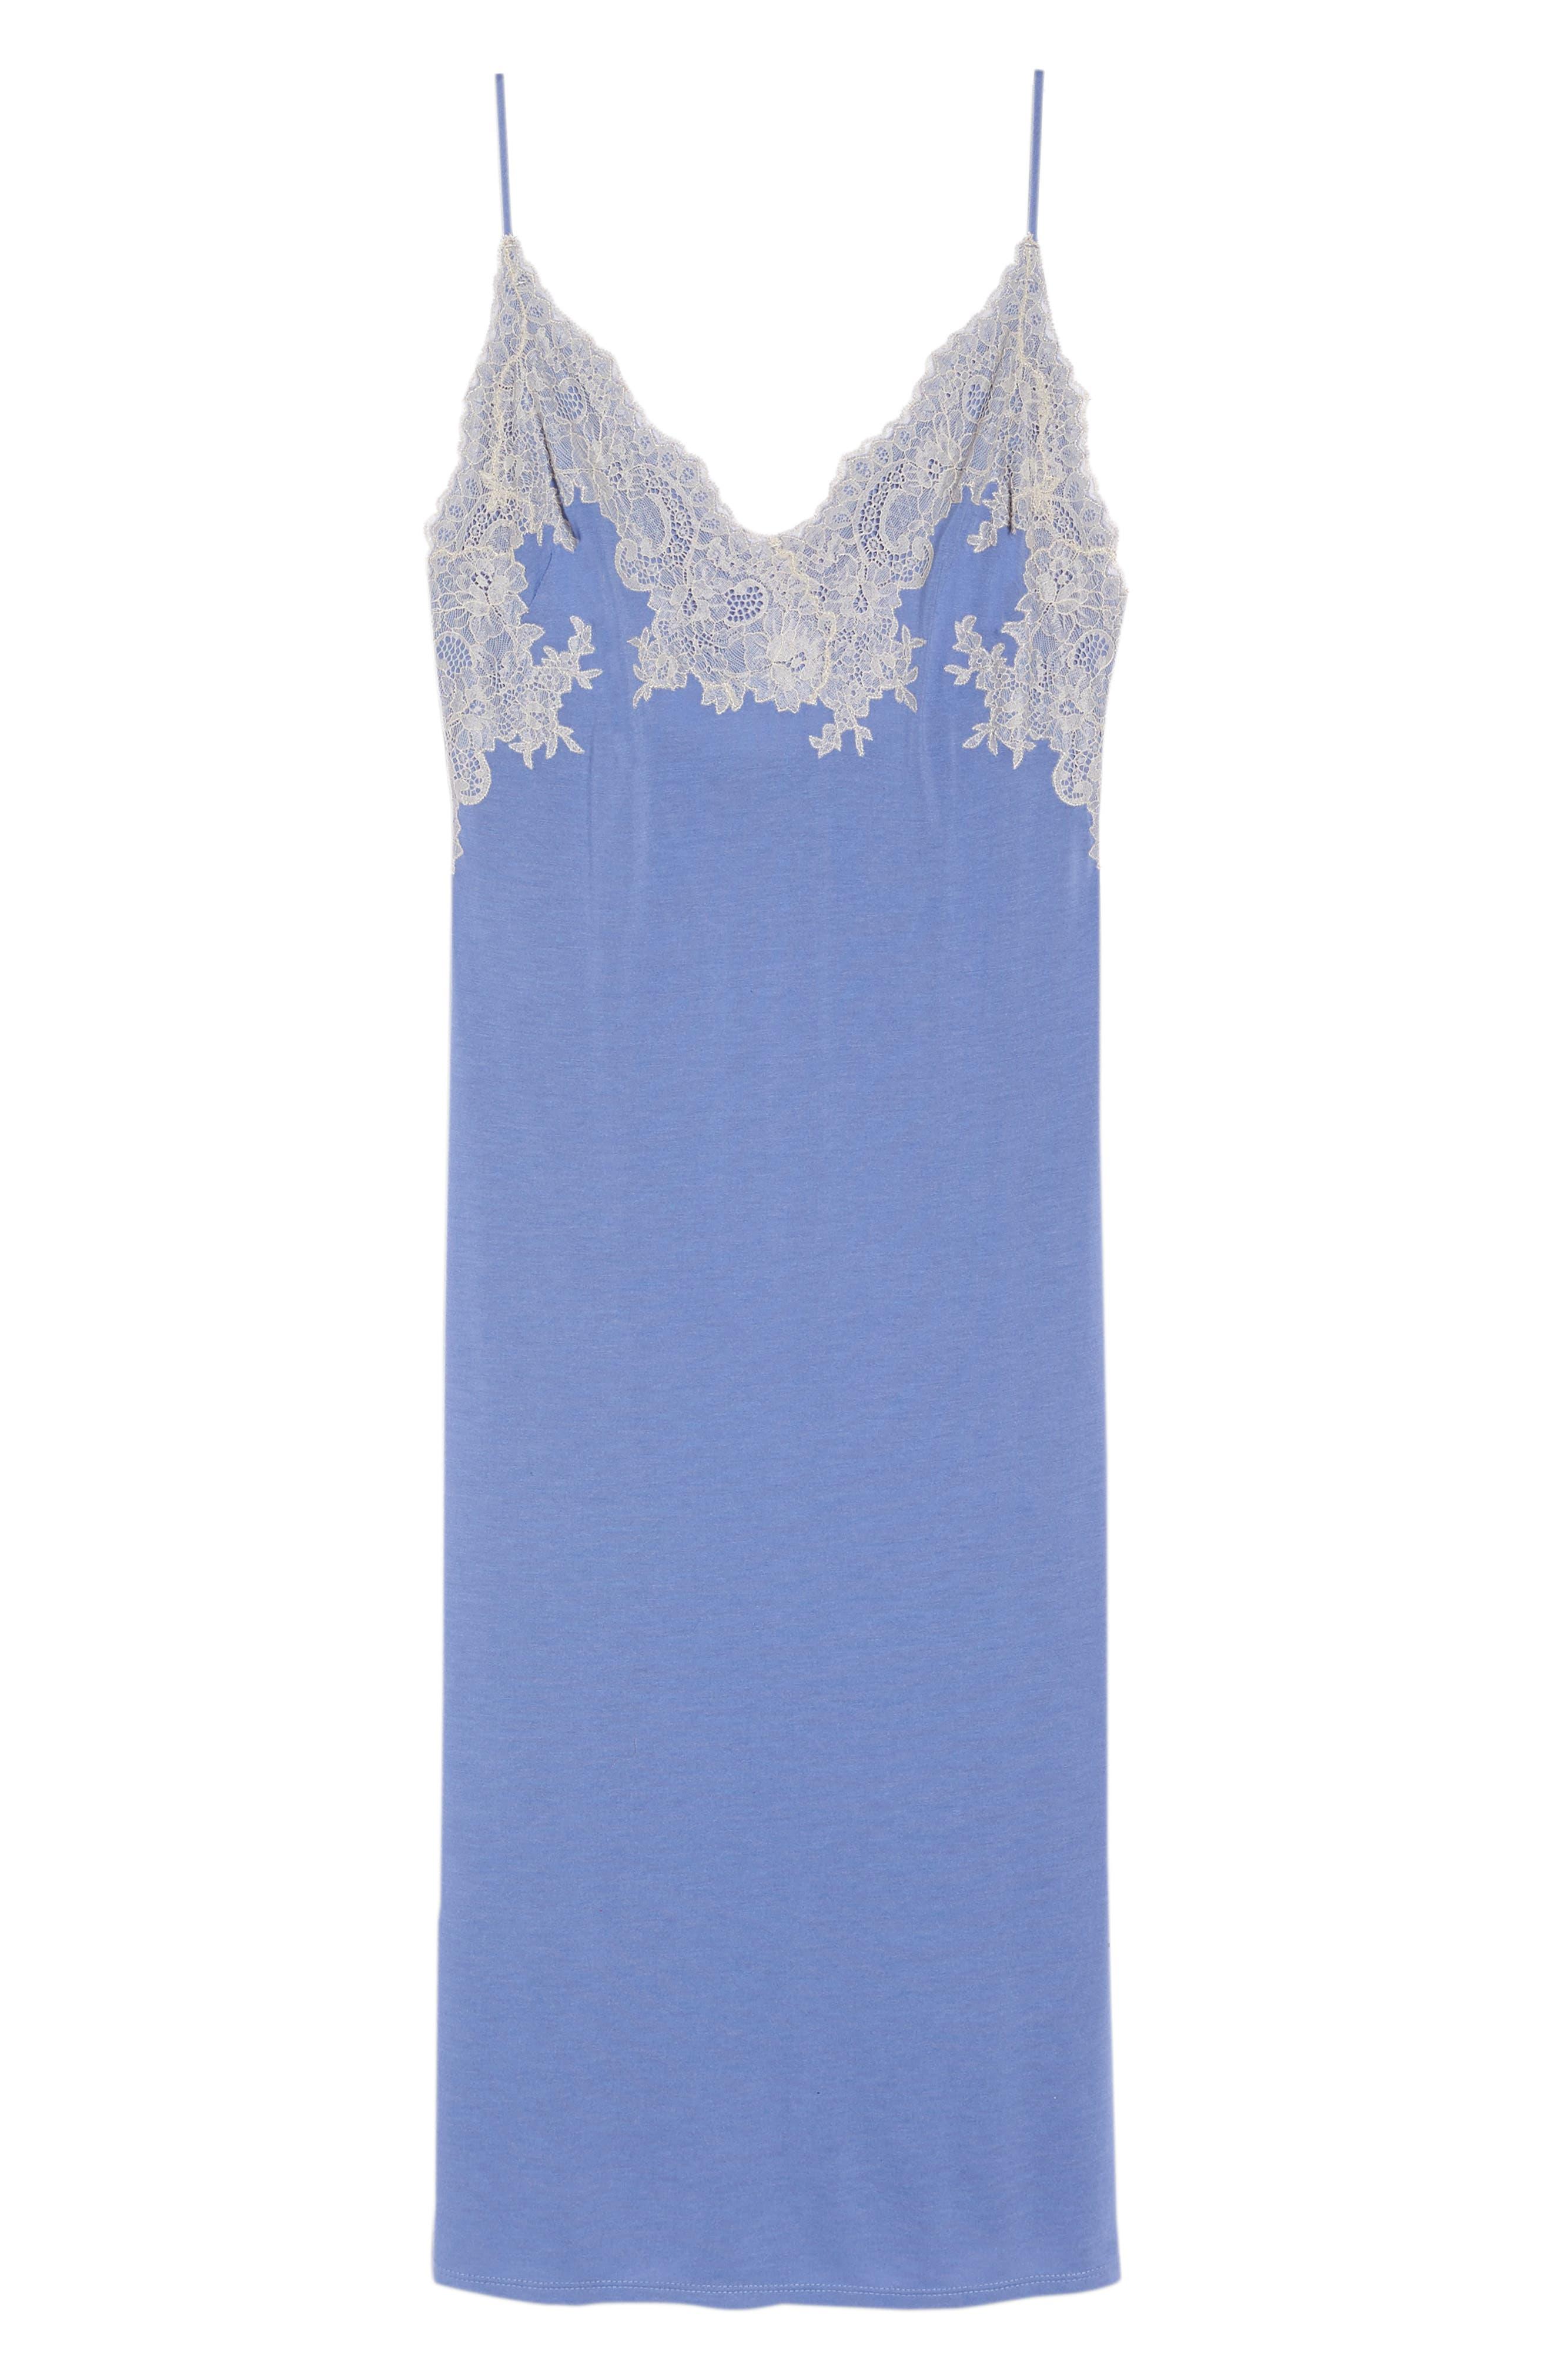 Luxe Shangri-La Nightgown,                             Alternate thumbnail 6, color,                             Wedgewood